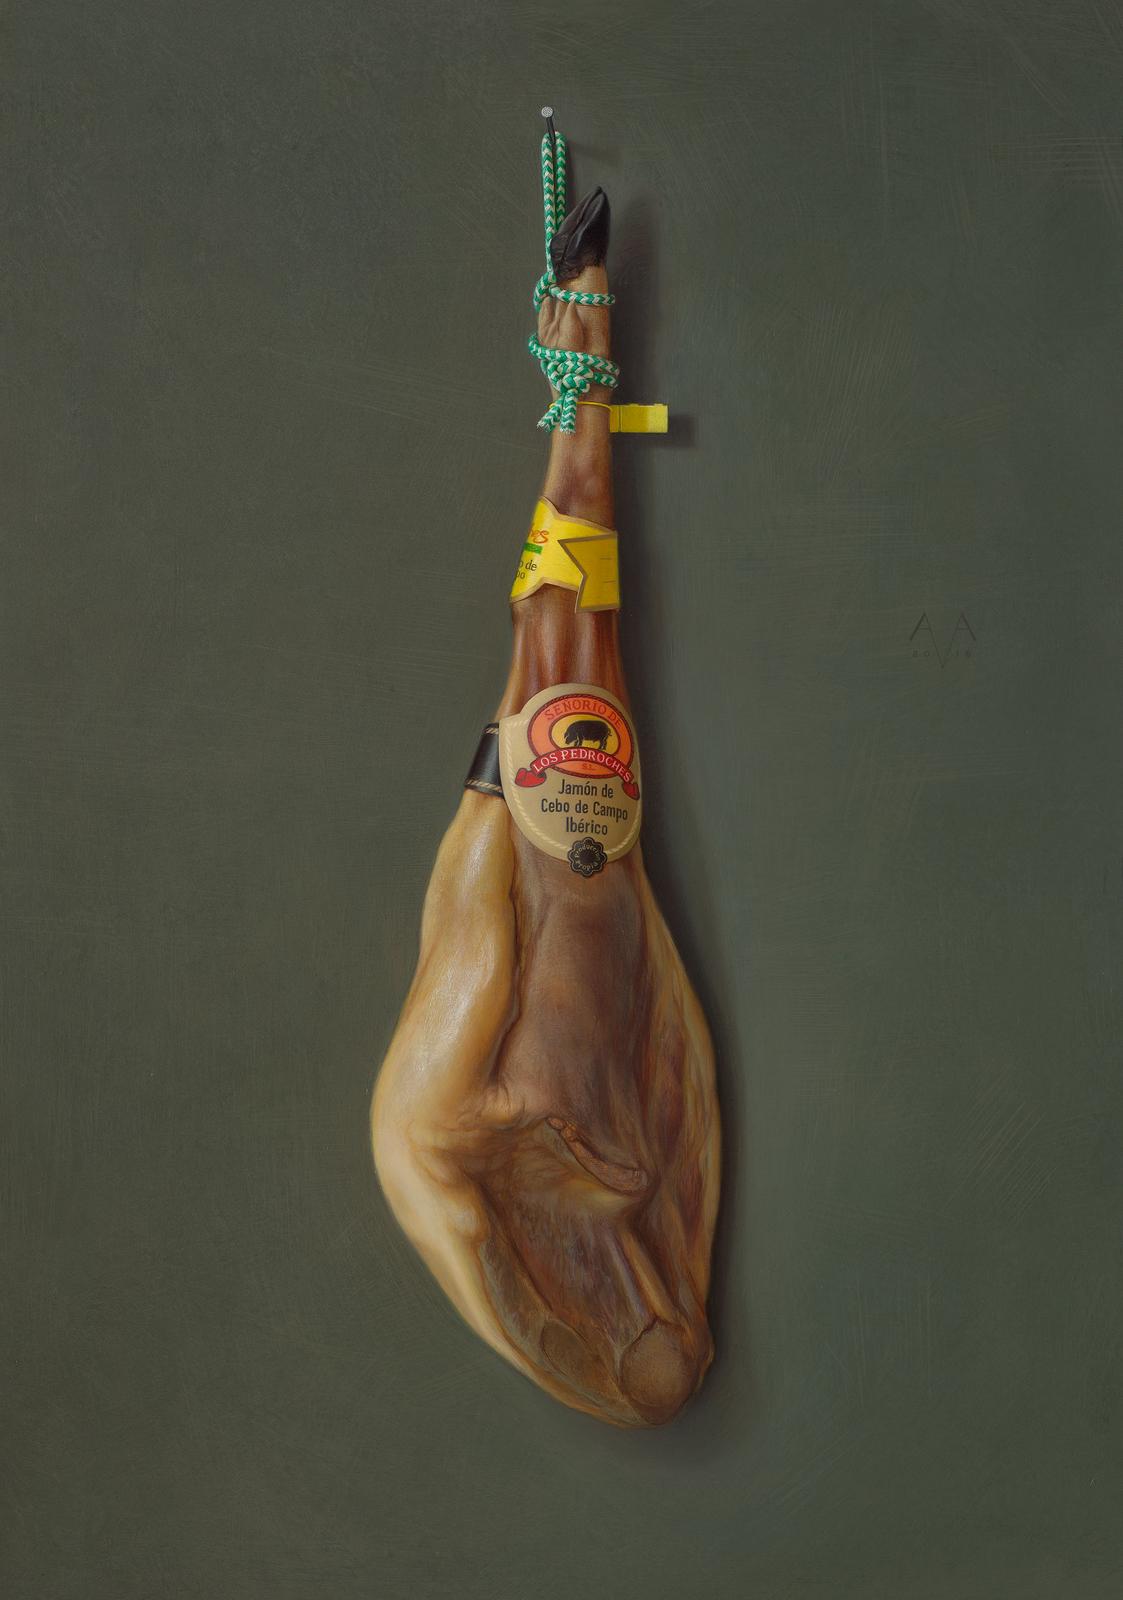 copyright Arnout van Albada - Jamon iberico pedroches - 105 x 74 cm - egg tempera and oil on panel - 2016 .jpg